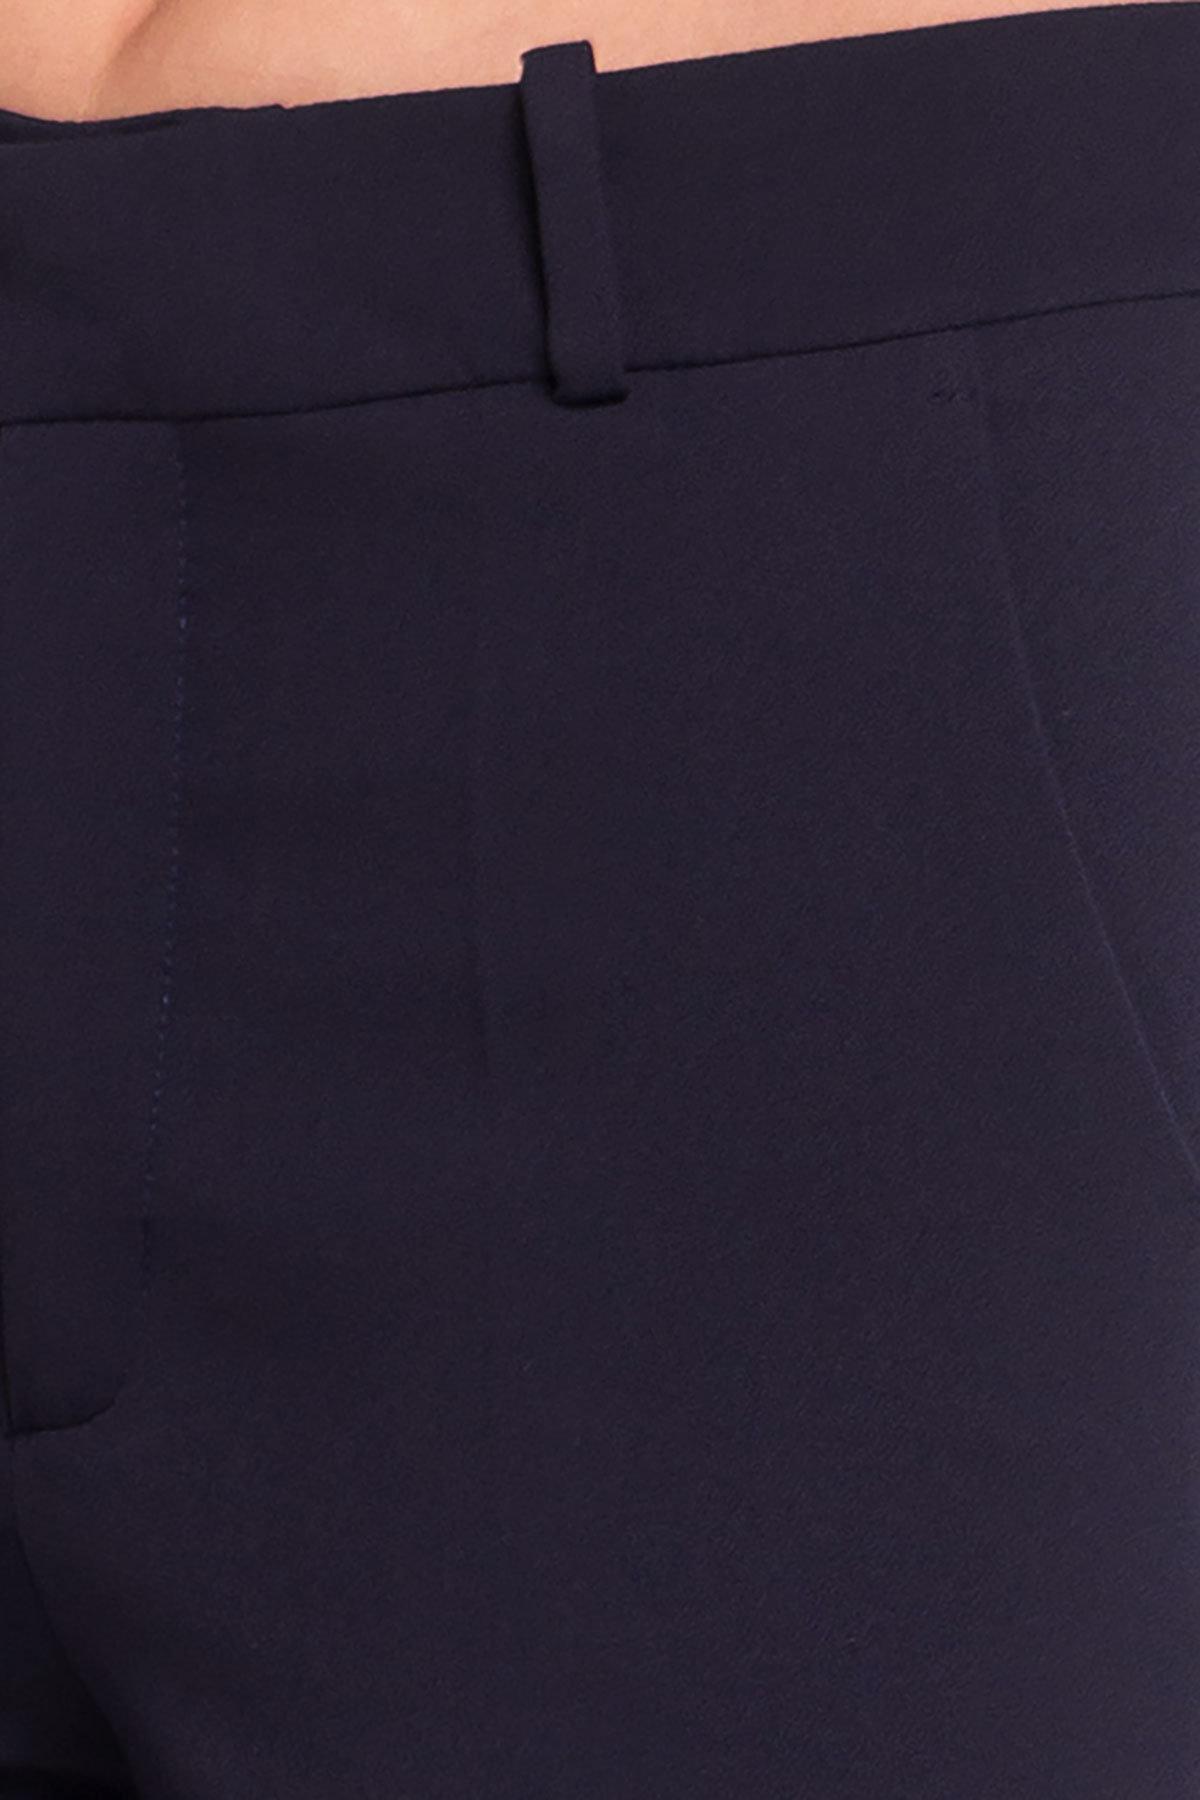 Брюки Макеба 3247 Цвет: Темно-синий/белый